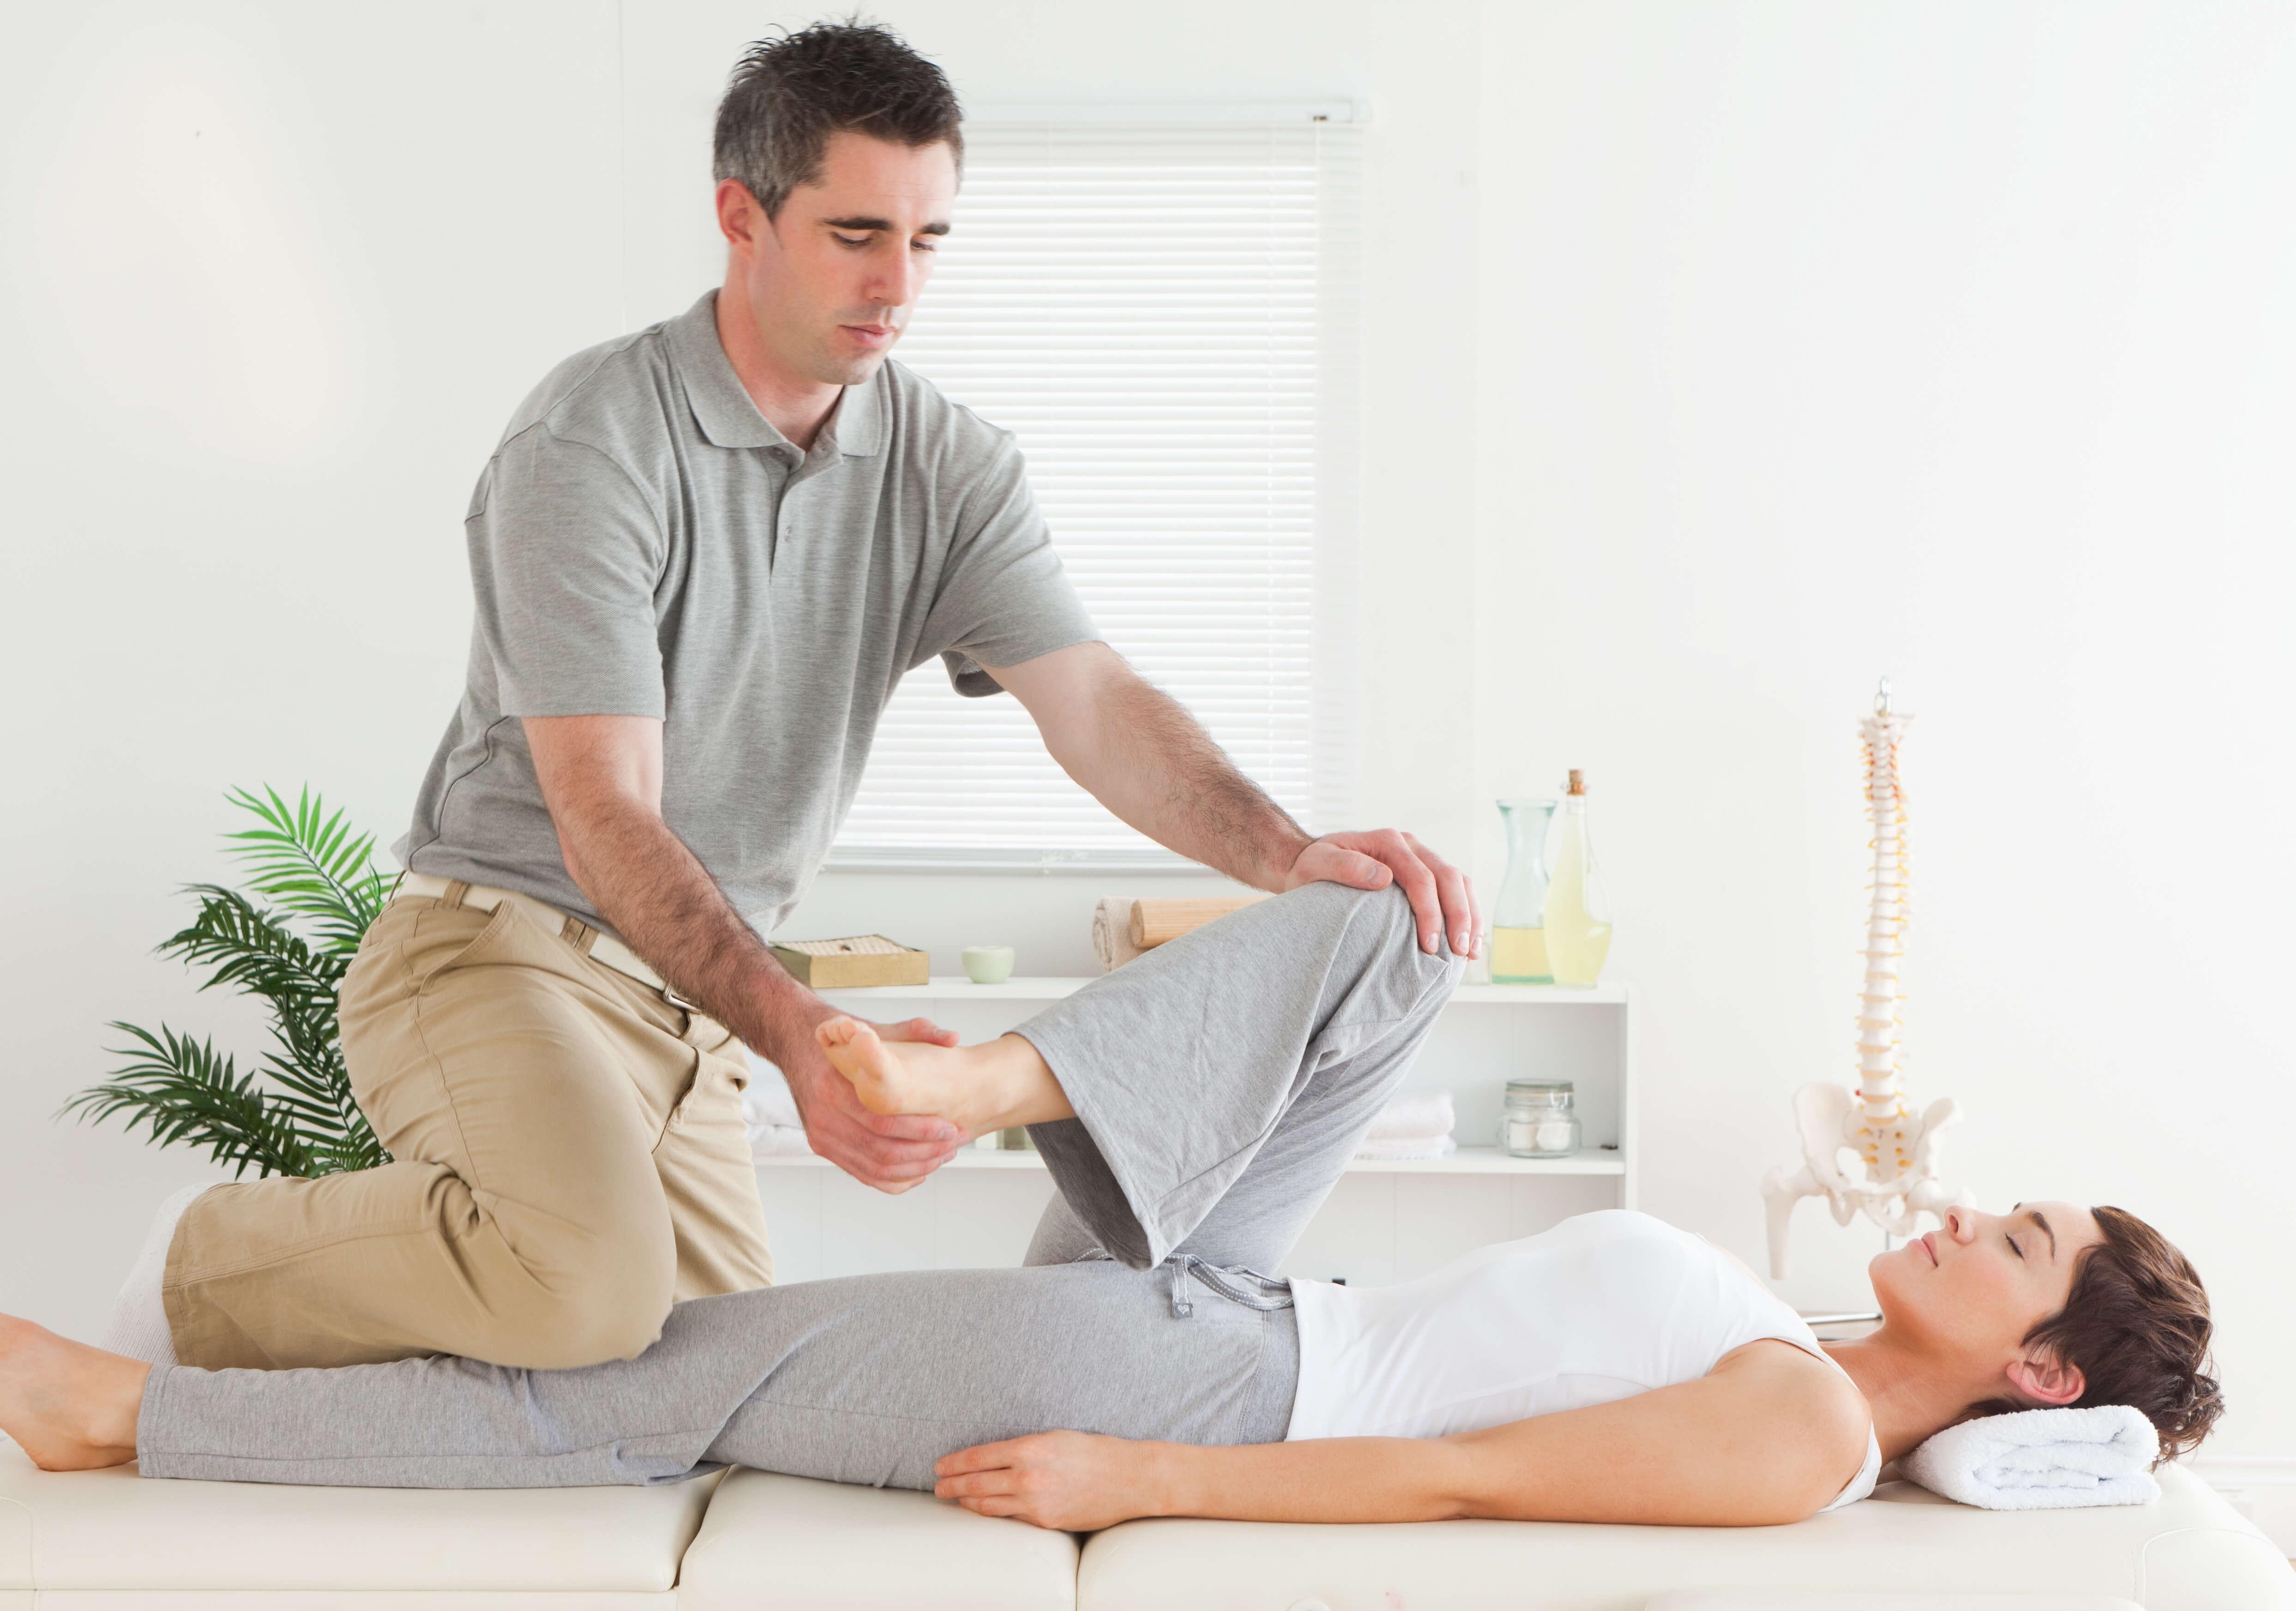 Why You Should Seek Post-Op Rehab in Grand Rapids